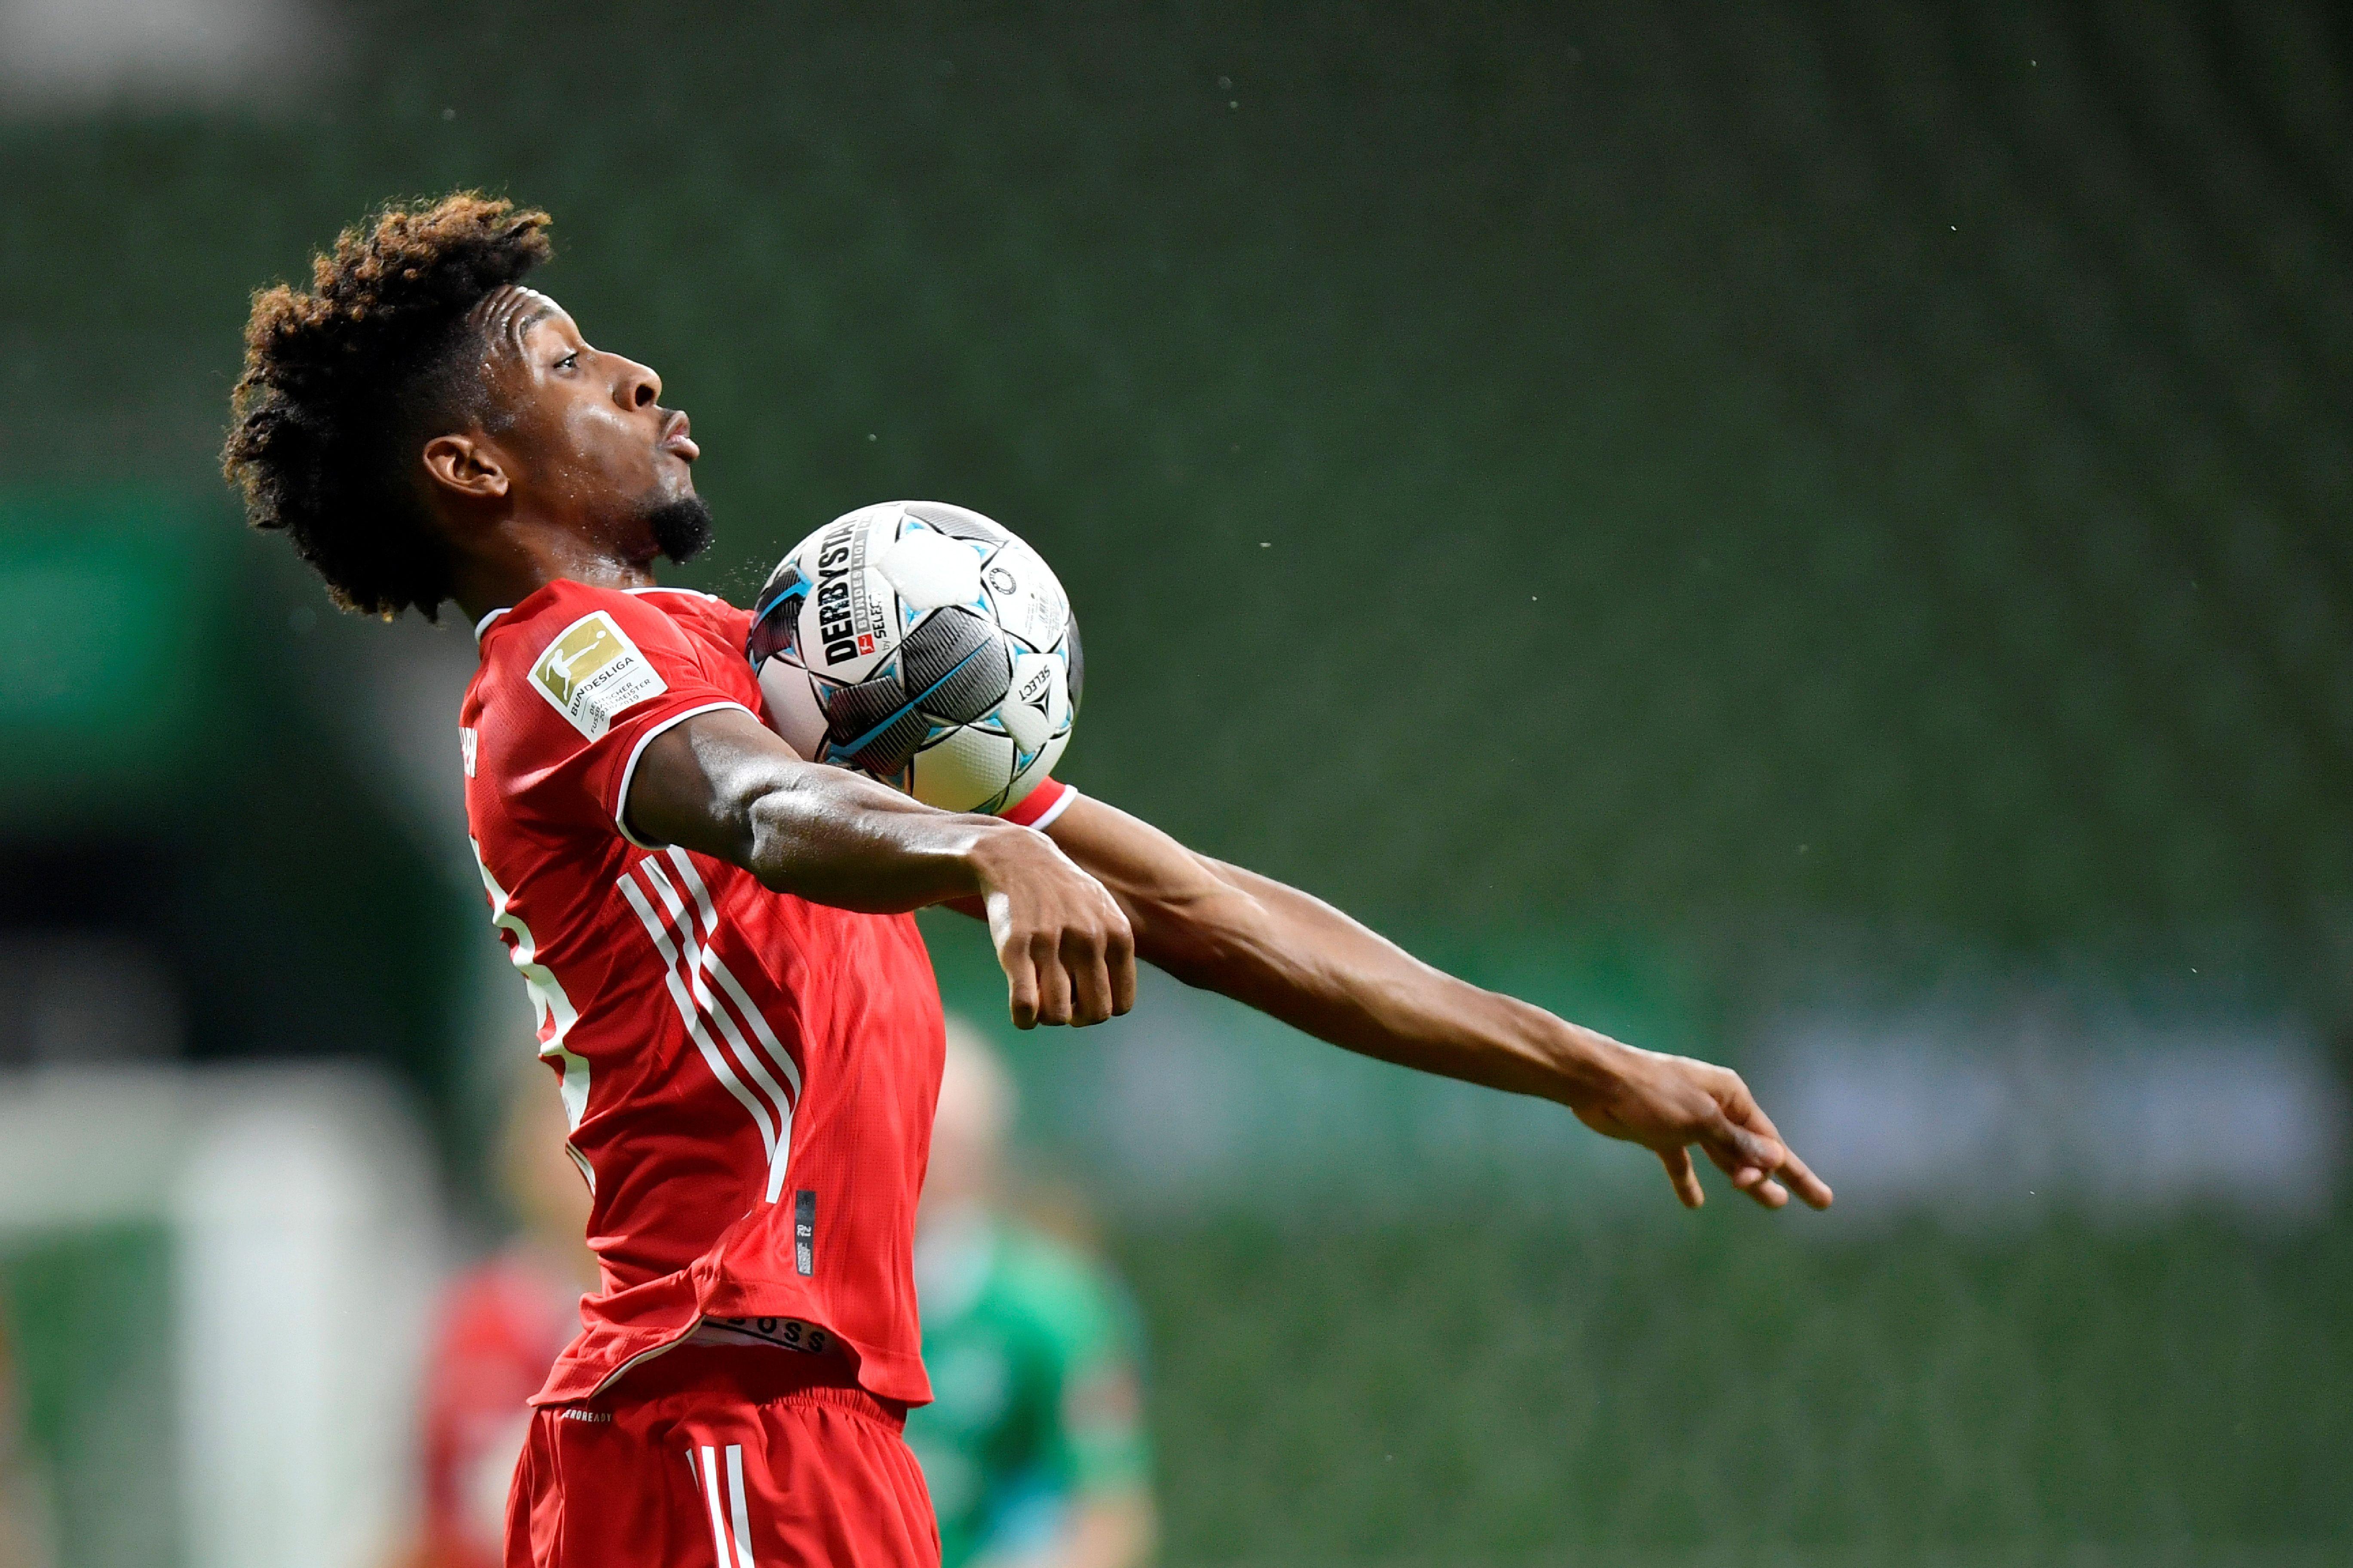 Football - Etranger - Bundesliga: Bayern Munich-Schalke 04 en direct